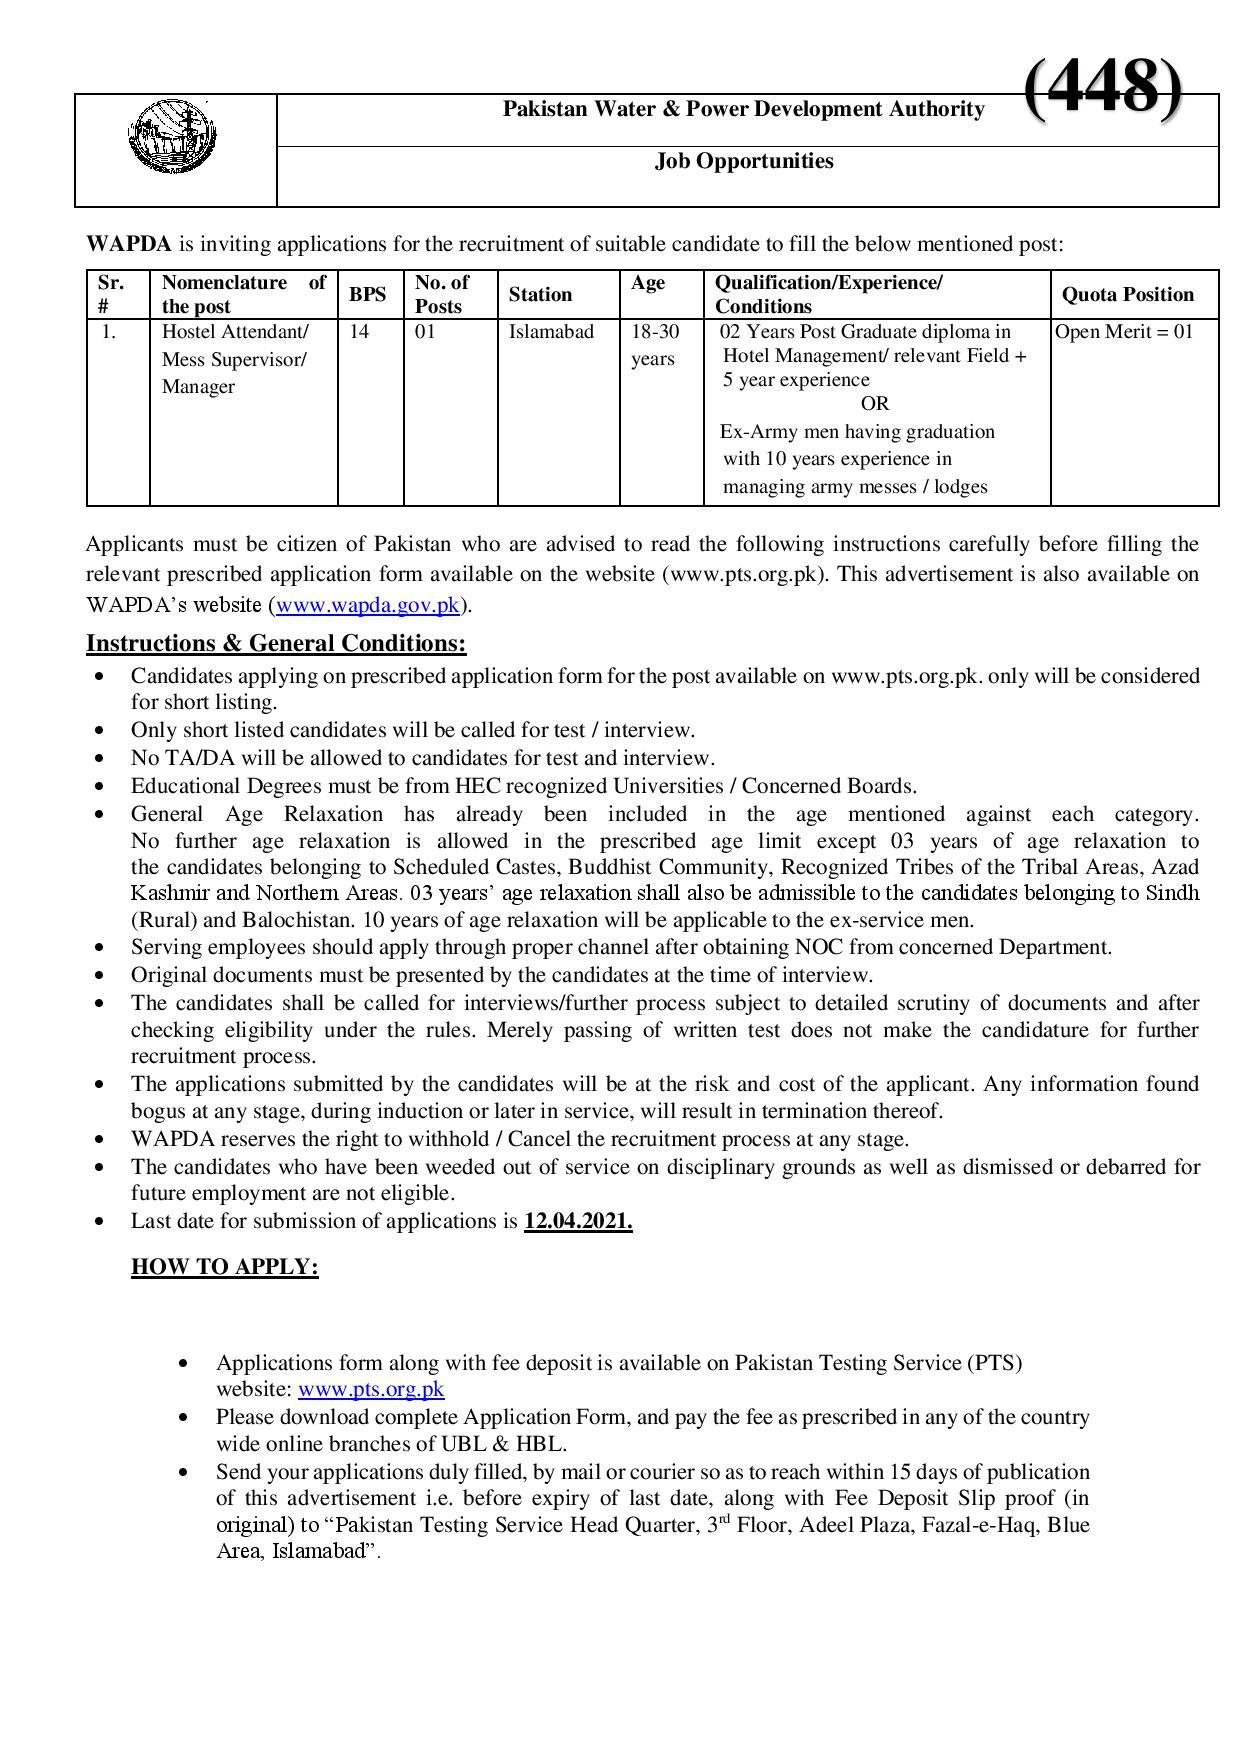 WAPDA Hostel Attendant Jobs Online Apply 1